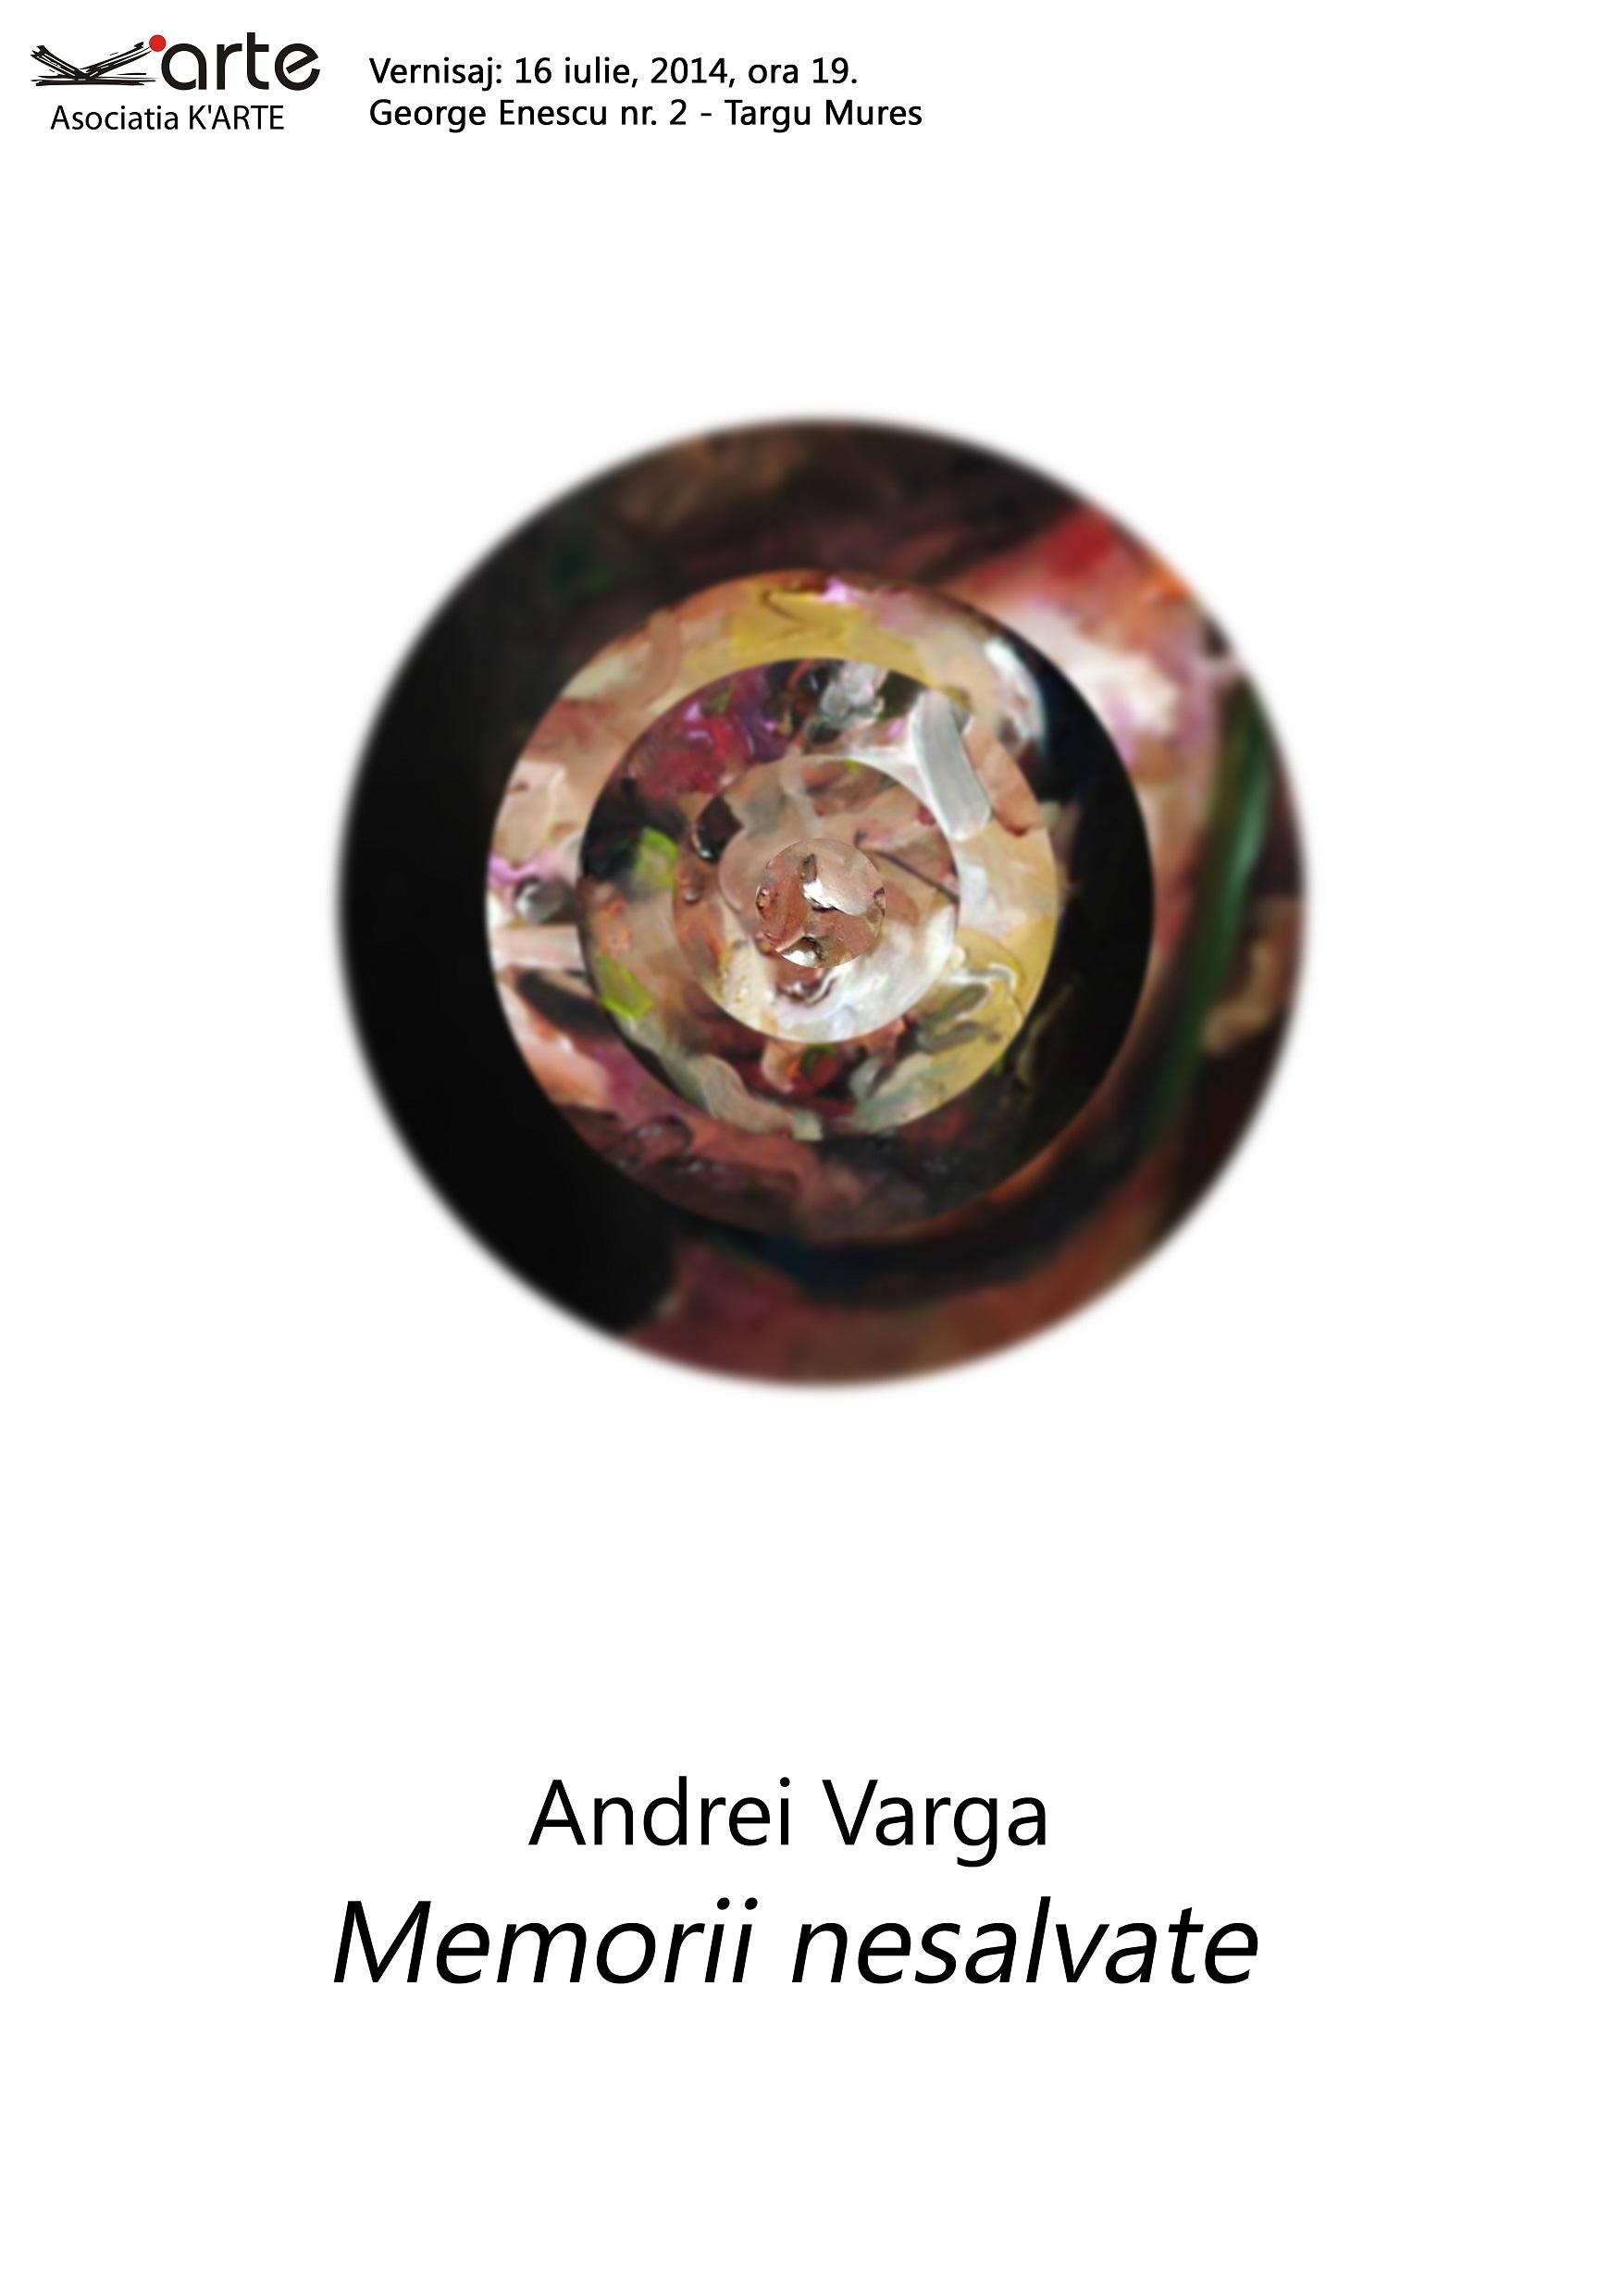 "Andrei Varga ""Memorii nesalvate"" @ Camera K'ARTE, Târgu Mureș"